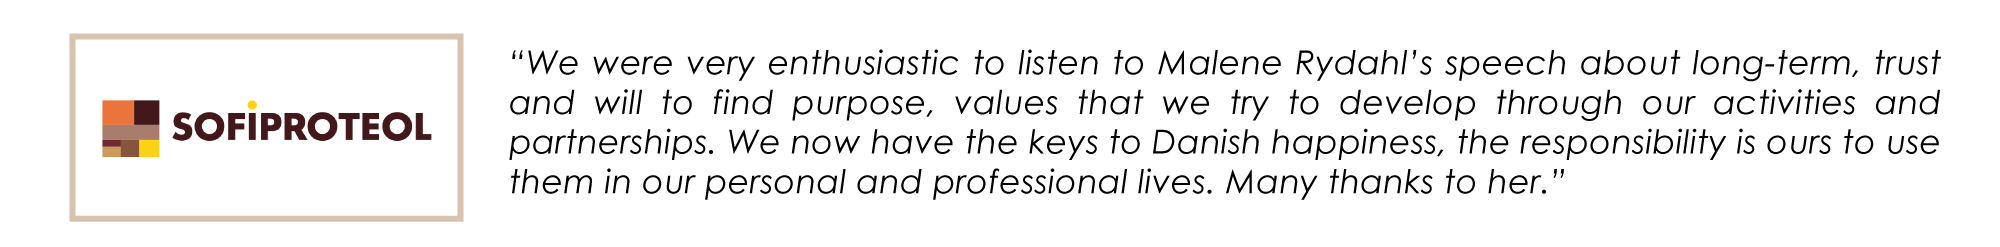 Sofiproteol-EN